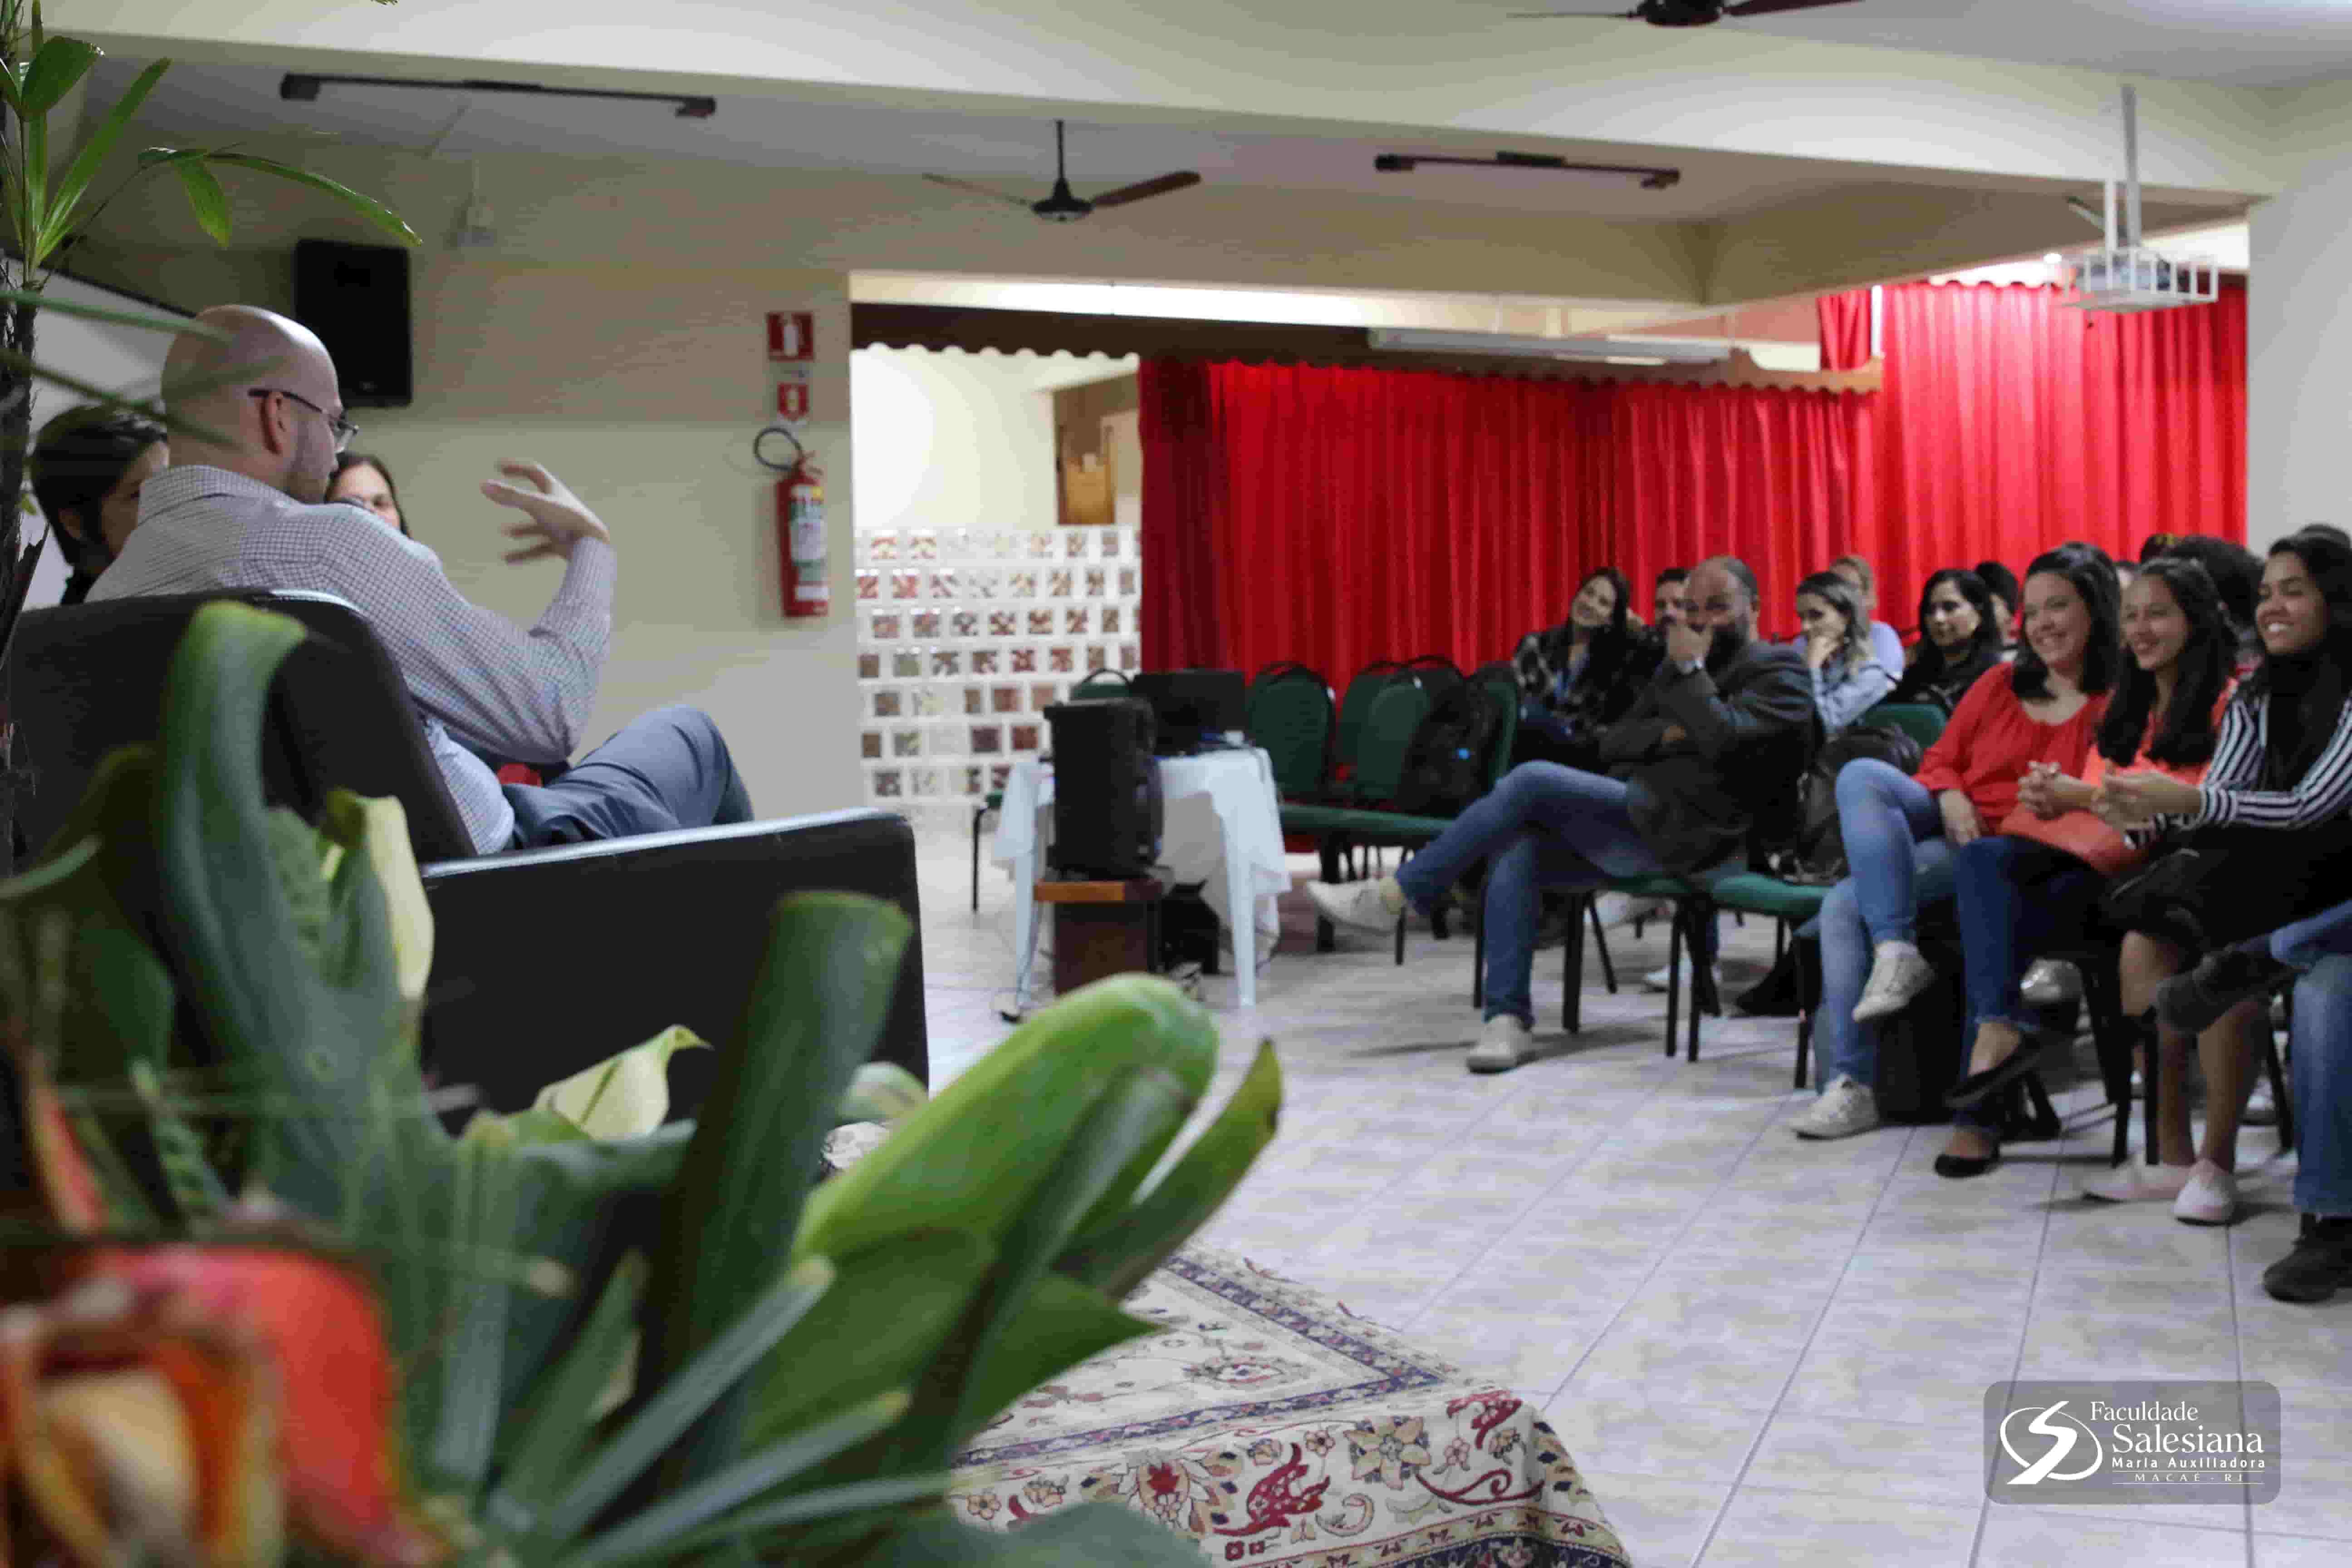 Salesiana comemora 10 anos do Curso de Psicologia